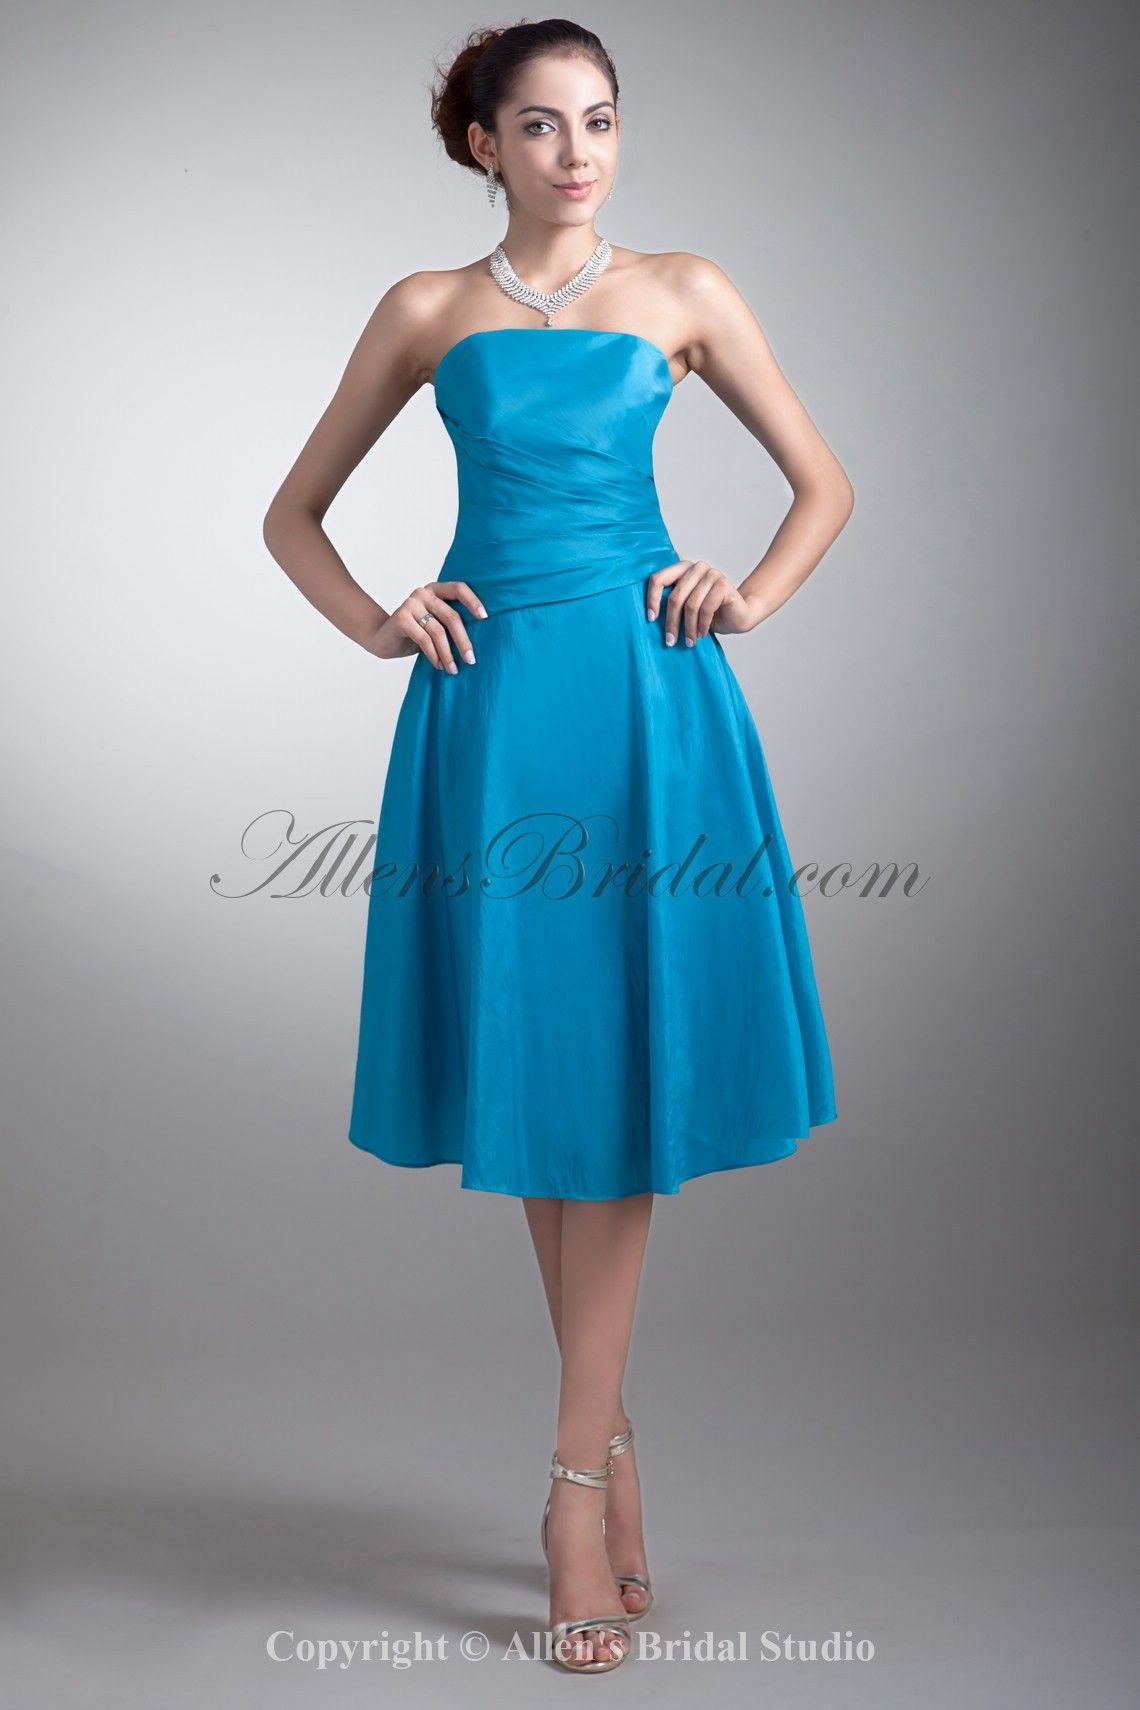 Taffeta Strapless Neckline Knee Length A-line Cocktail Dress on sale ...